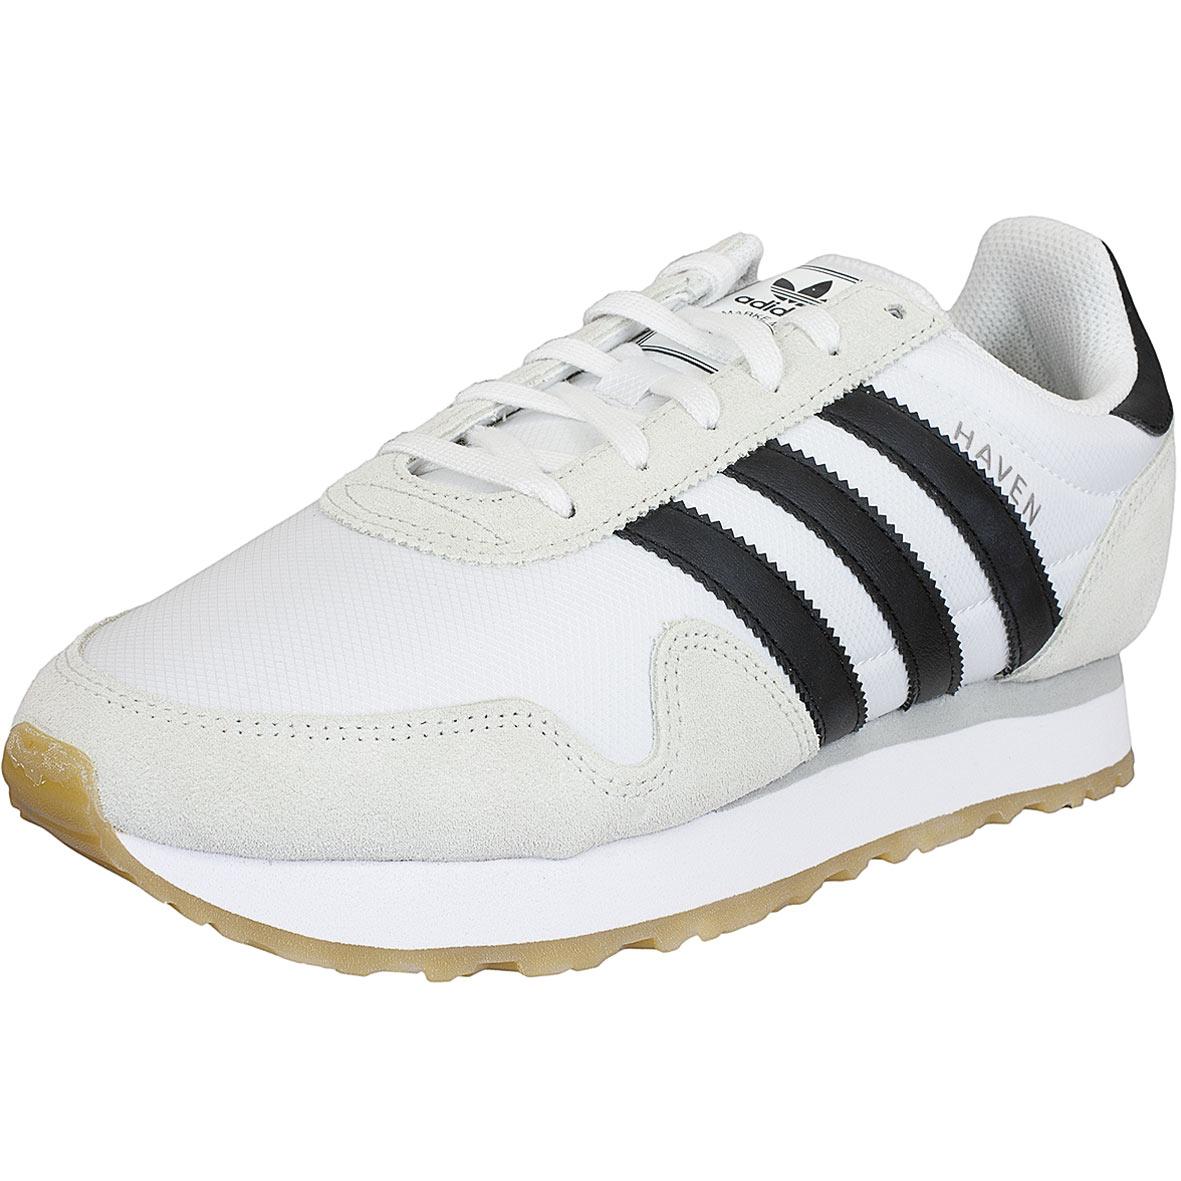 ☆ Adidas Originals Damen Sneaker Haven weißschwarz hier